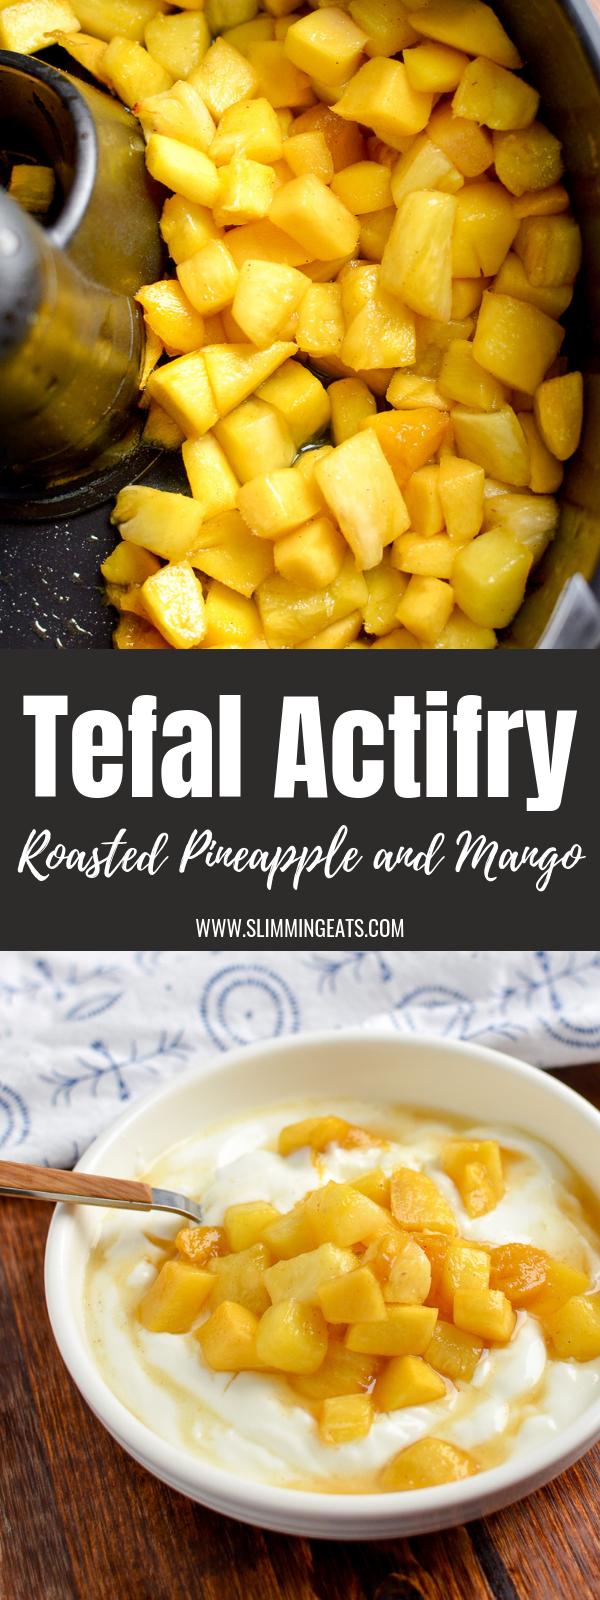 Roast Pineapple and Mango pin image